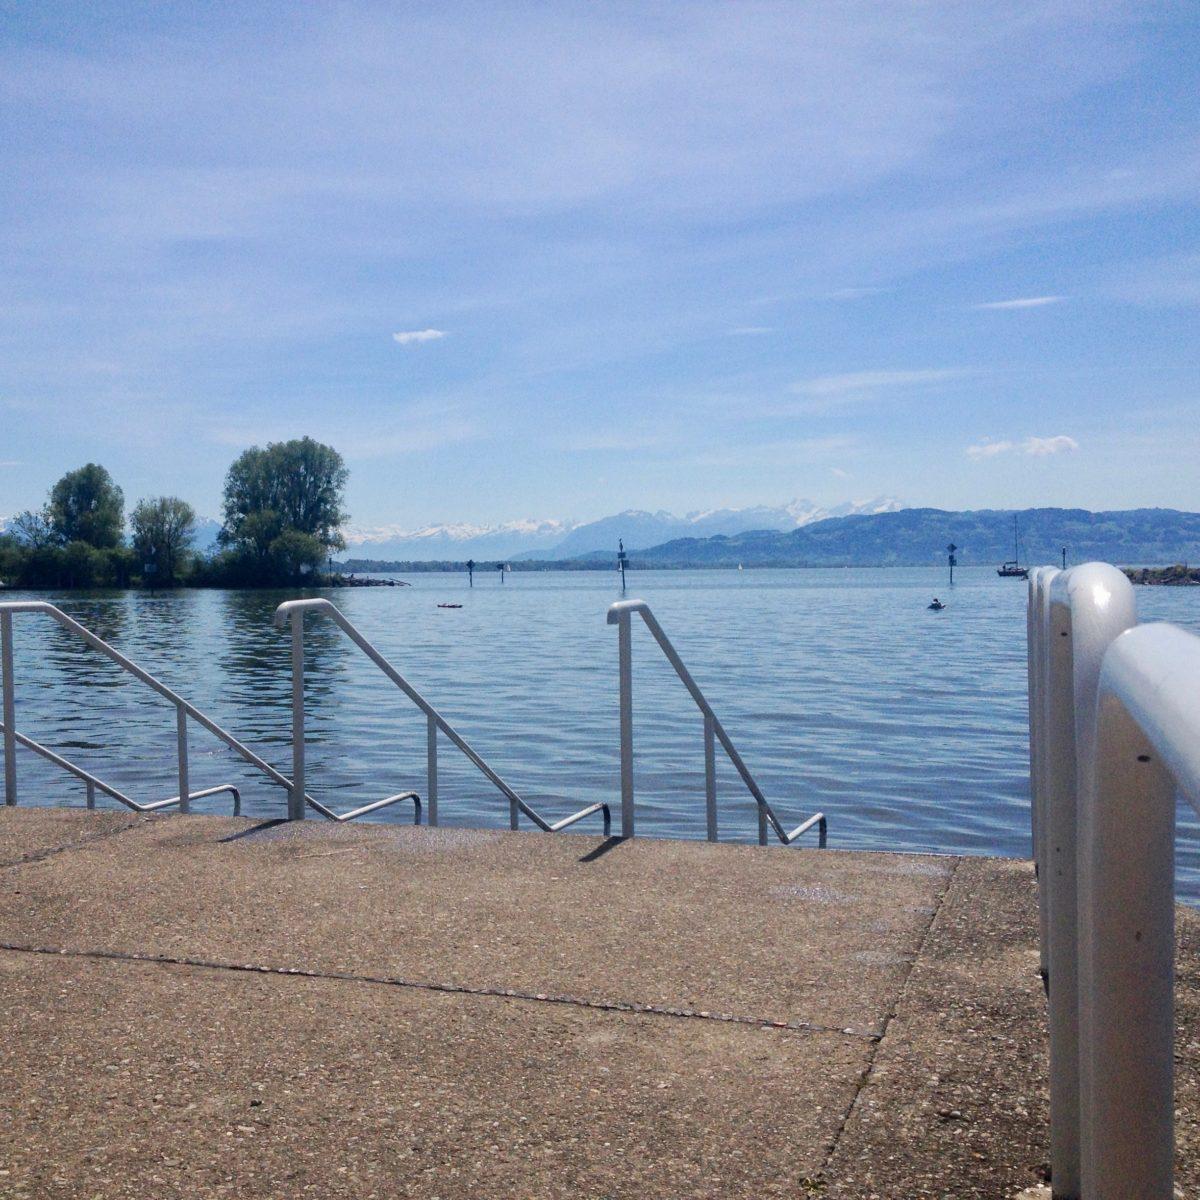 Direkter Zugang zum See: Park Camping Lindau am Bodensee